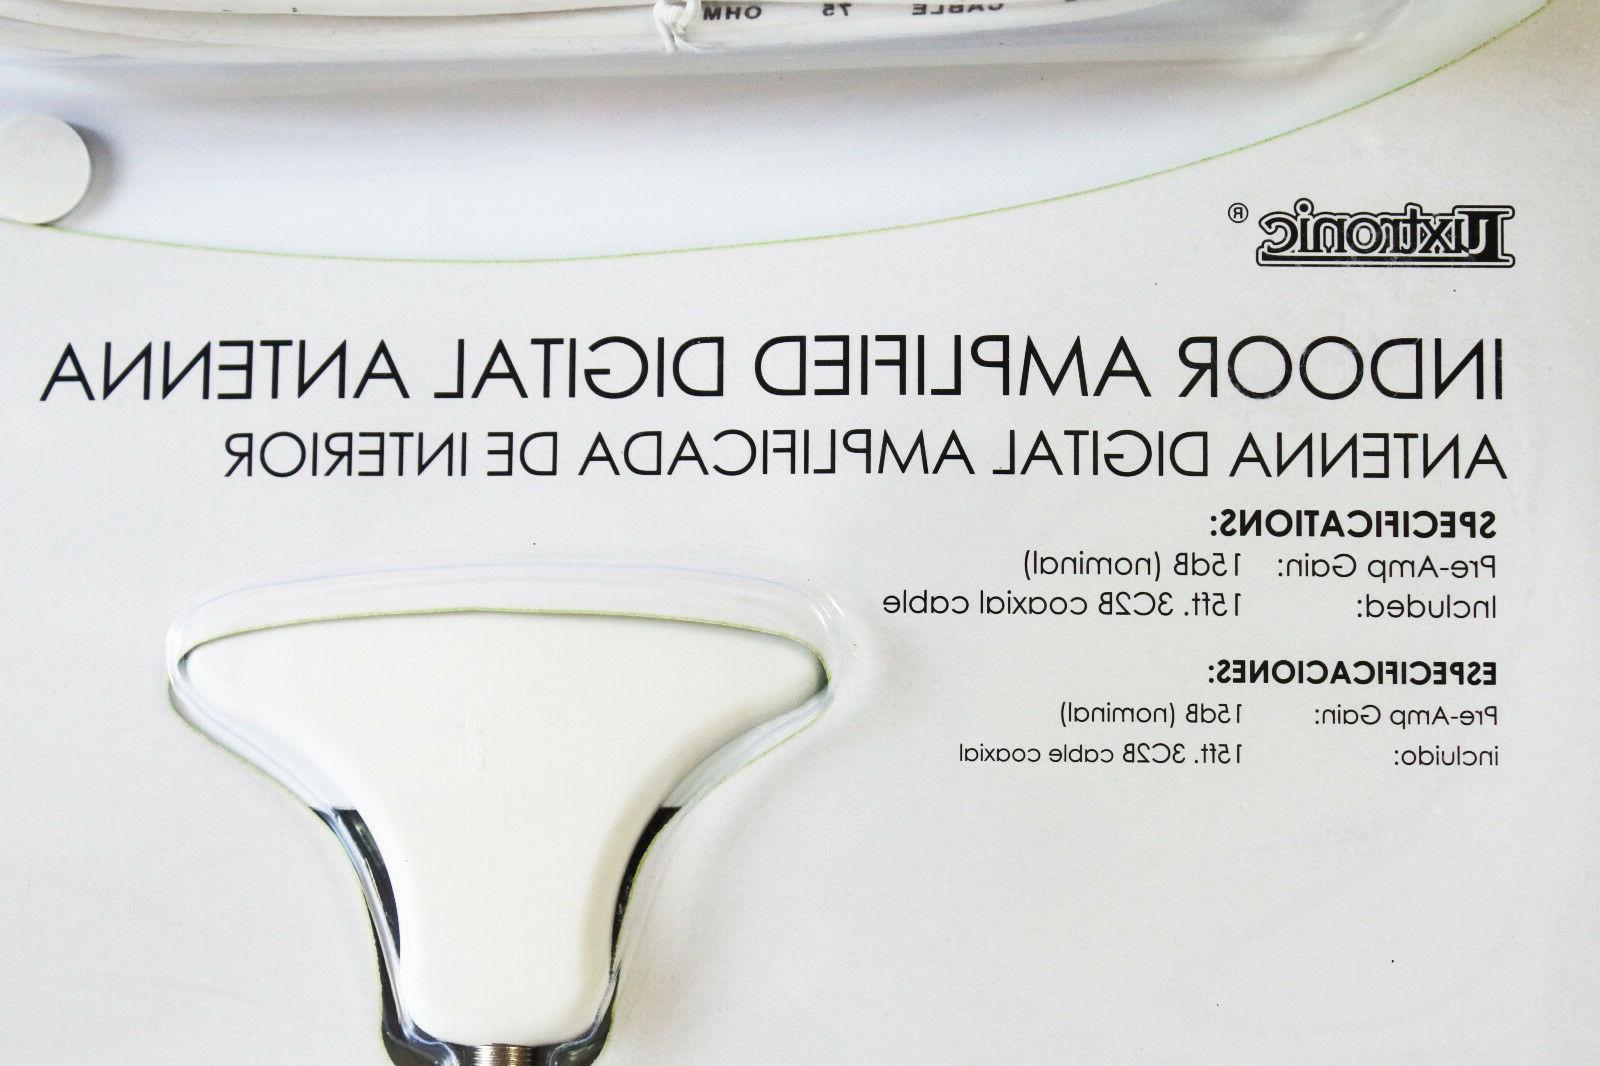 Flat HD Digital Indoor Amplified TV Antenna HDTV with 65 Miles Range